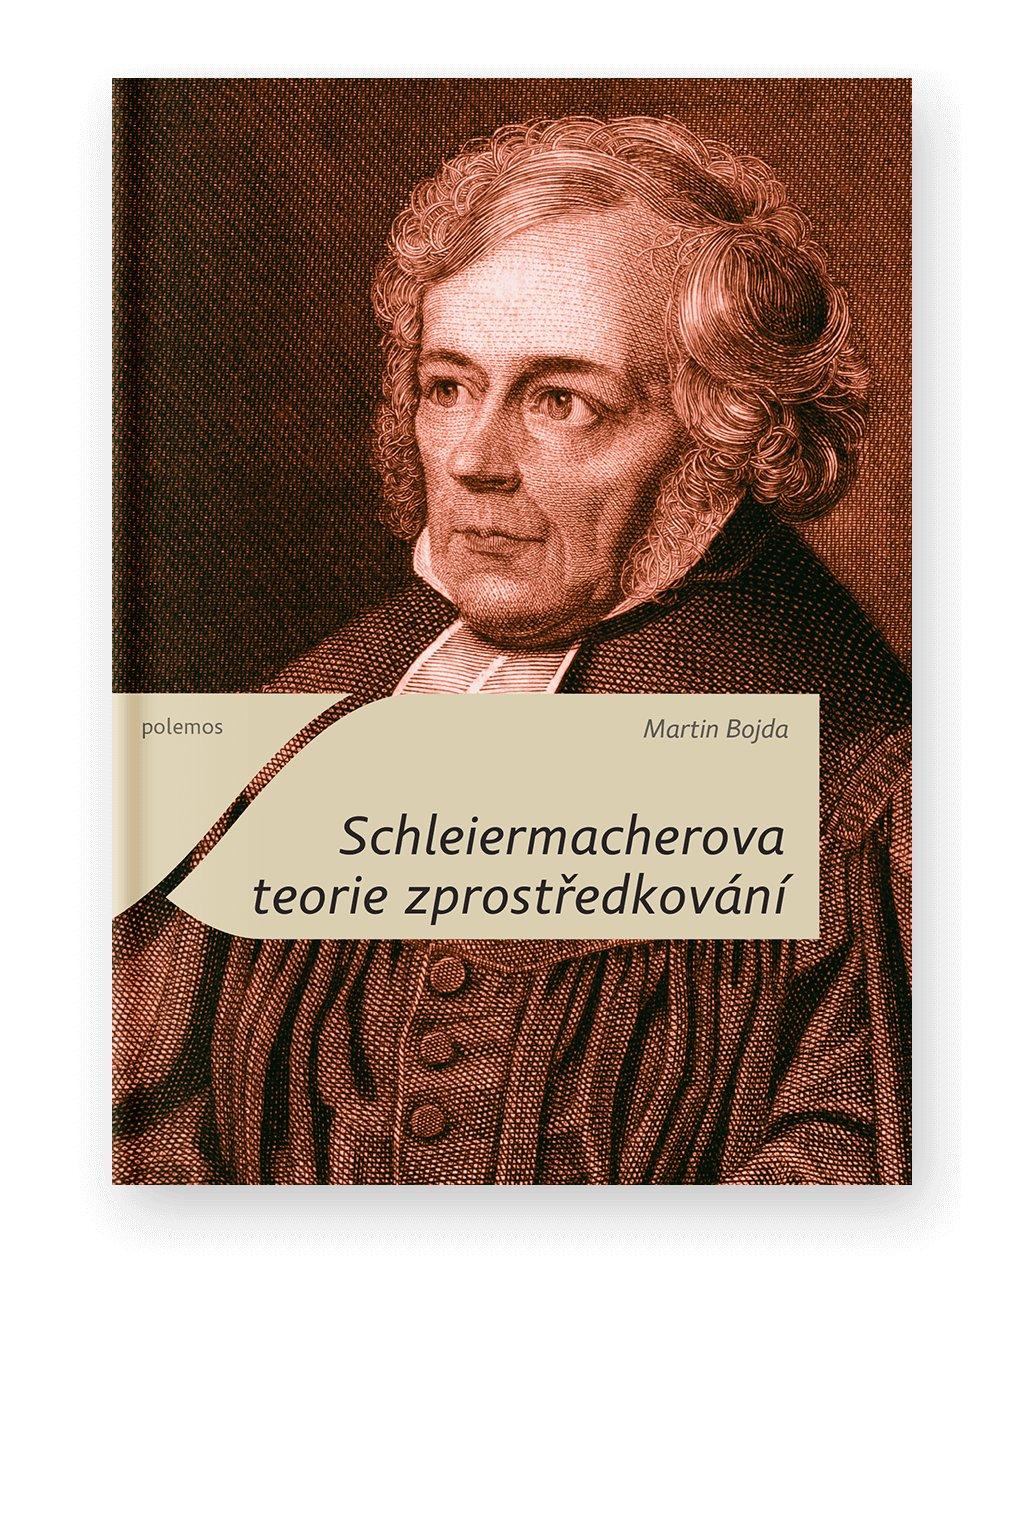 1119 1 schleiermacherova teorie zprostredkovani